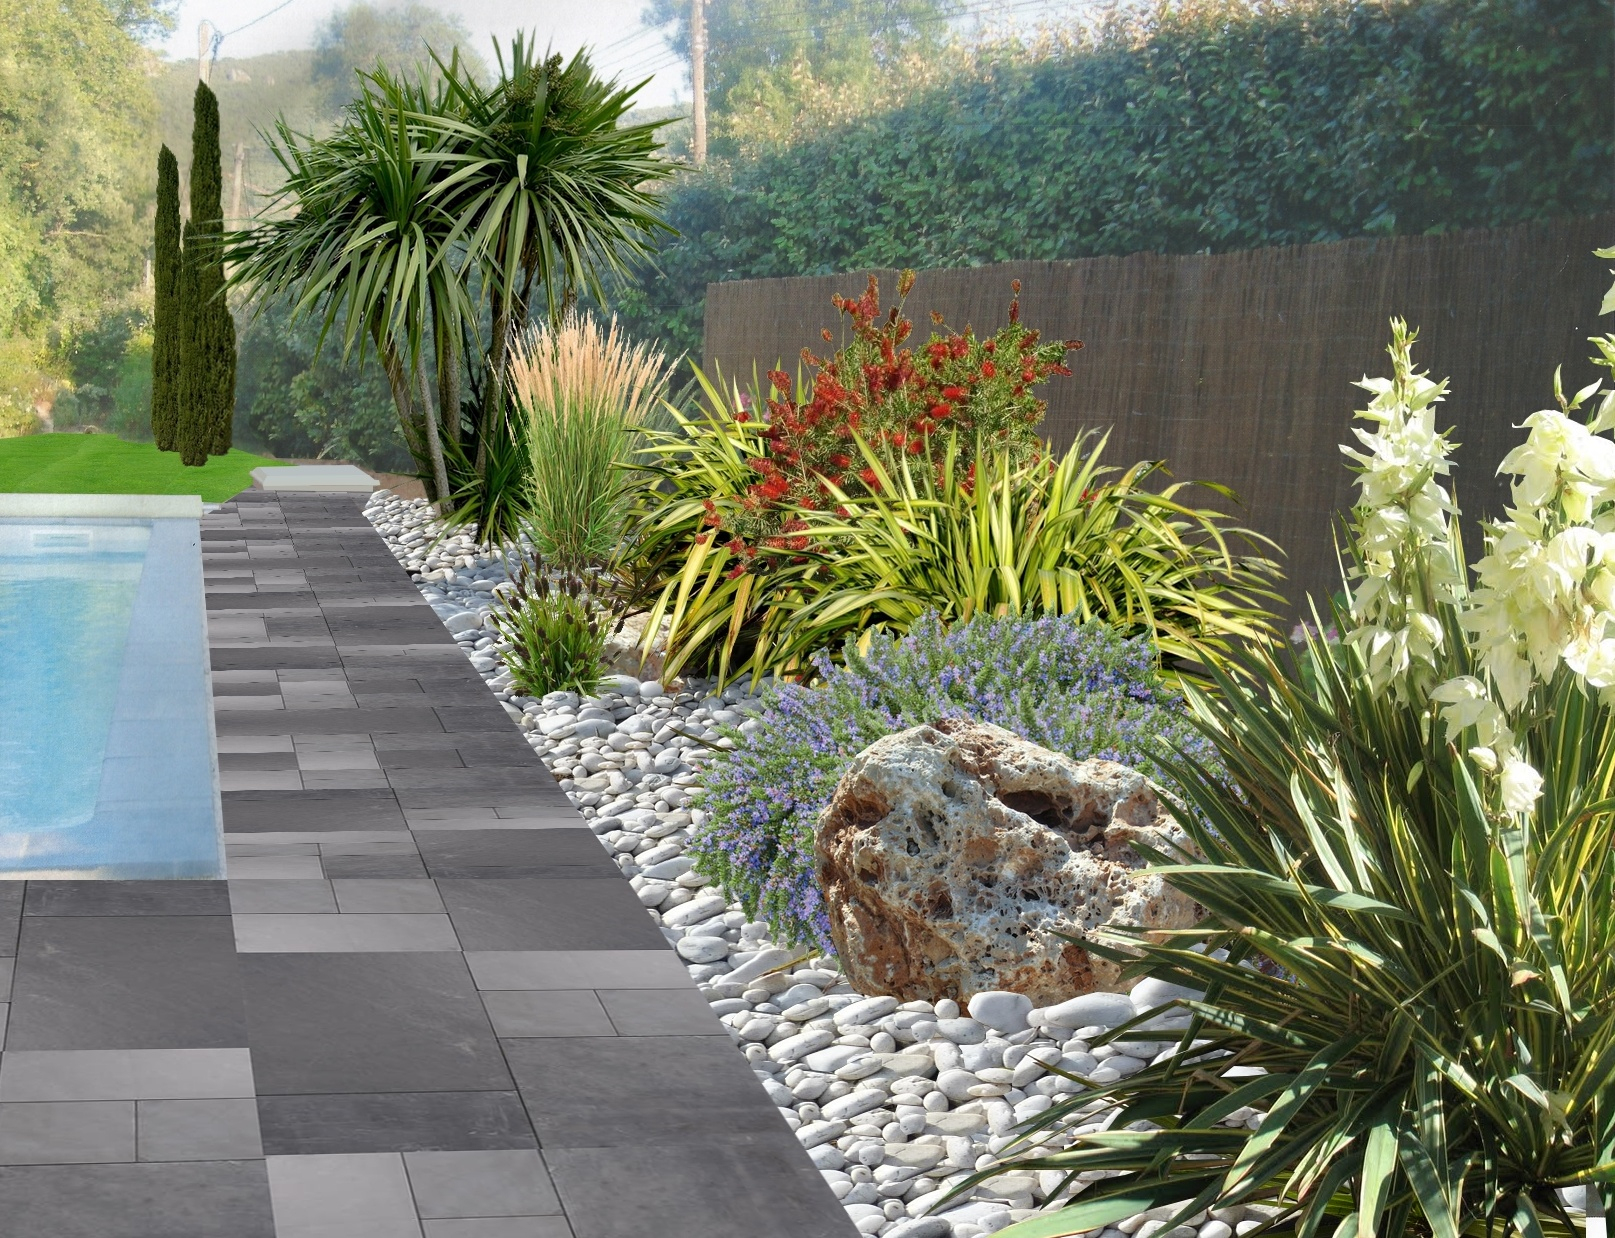 Aménager Un Jardin De Galets concernant Jardin Avec Galets Blancs